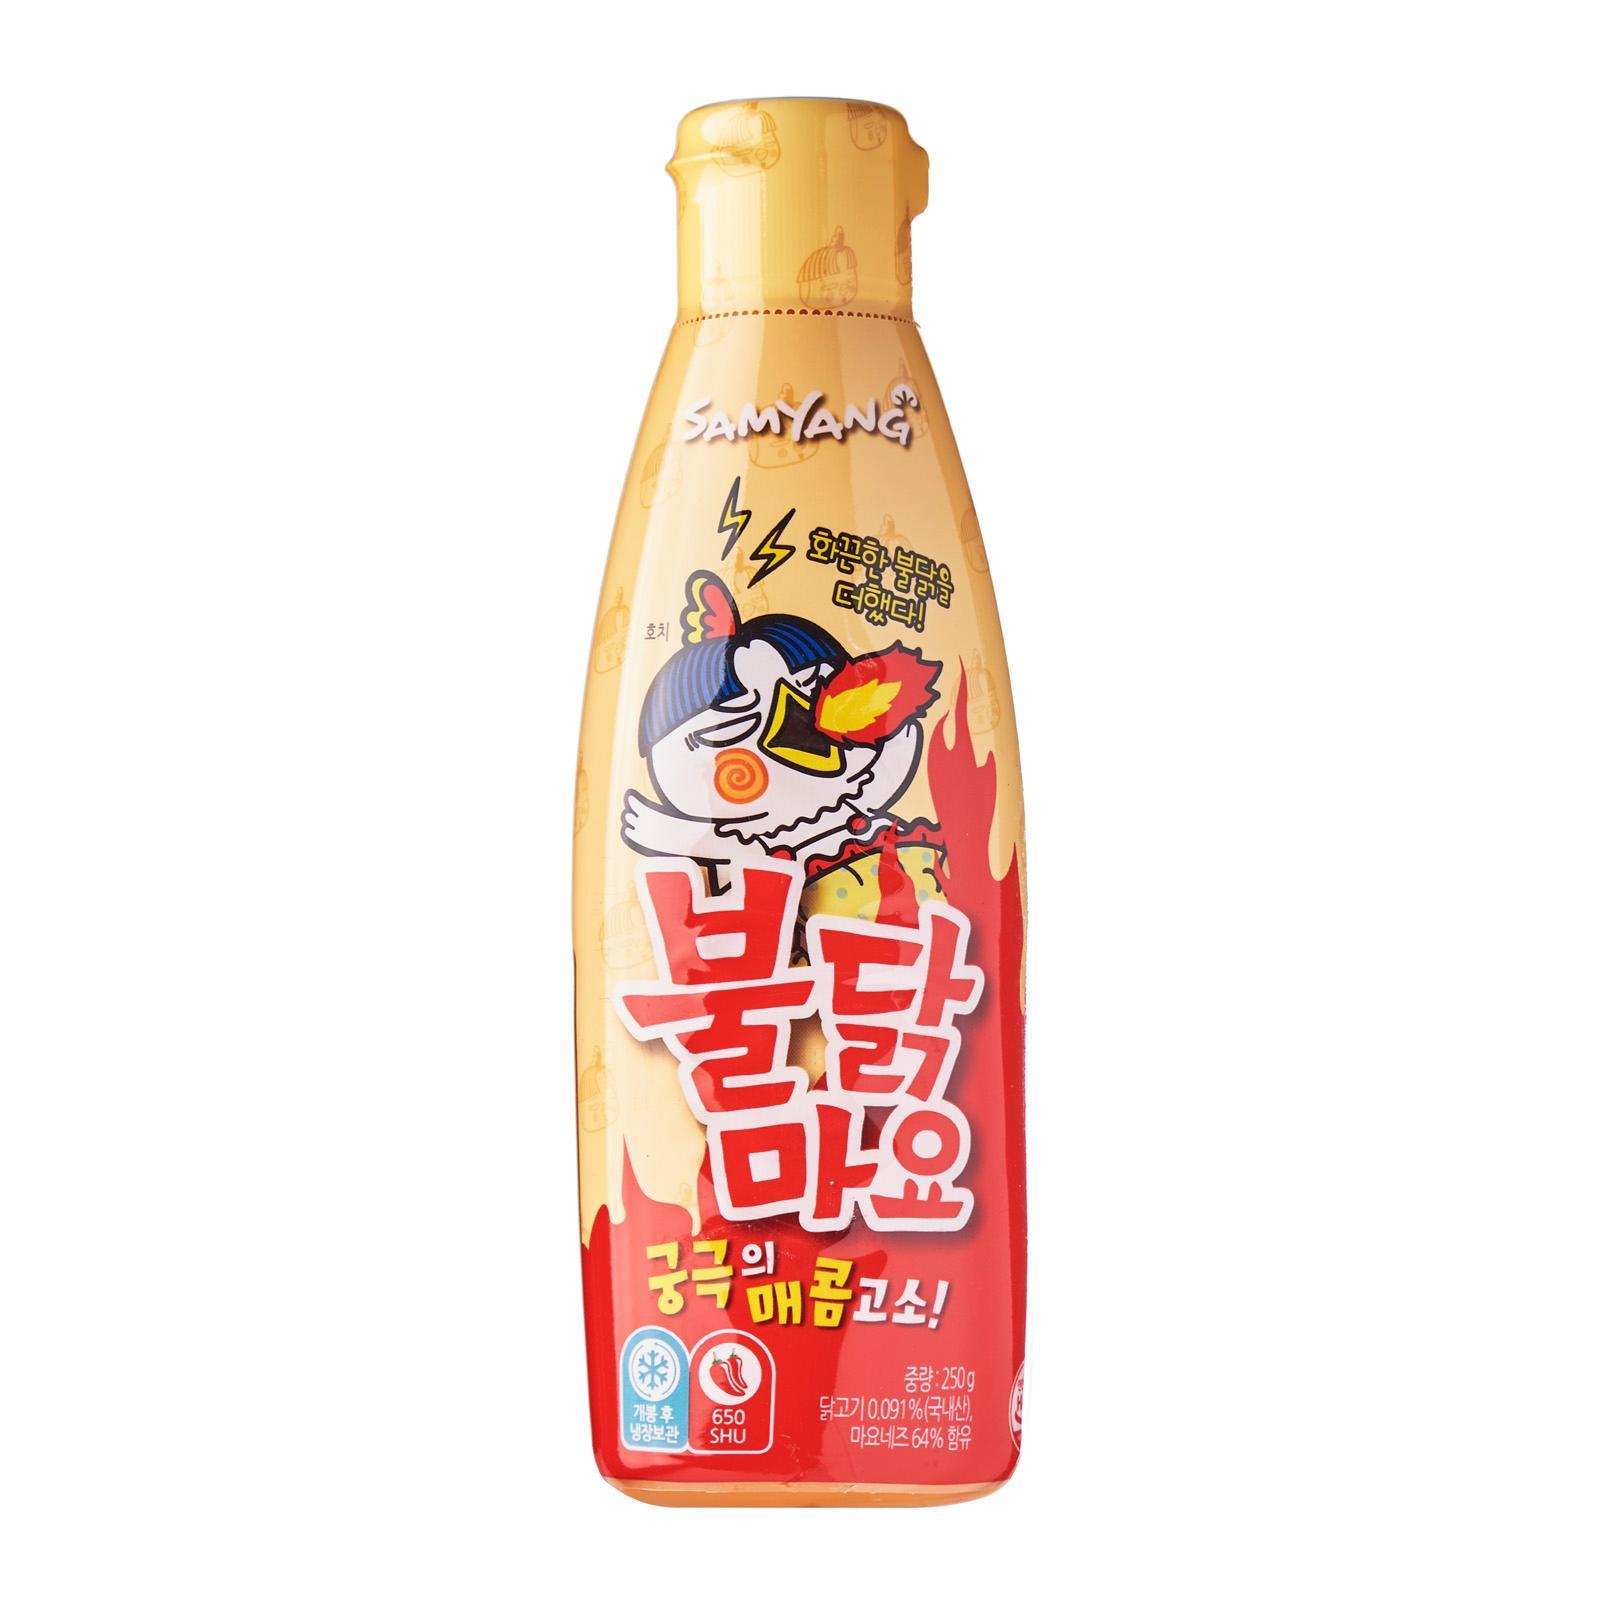 Samyang Korean Hot Chicken Mayo Sauce